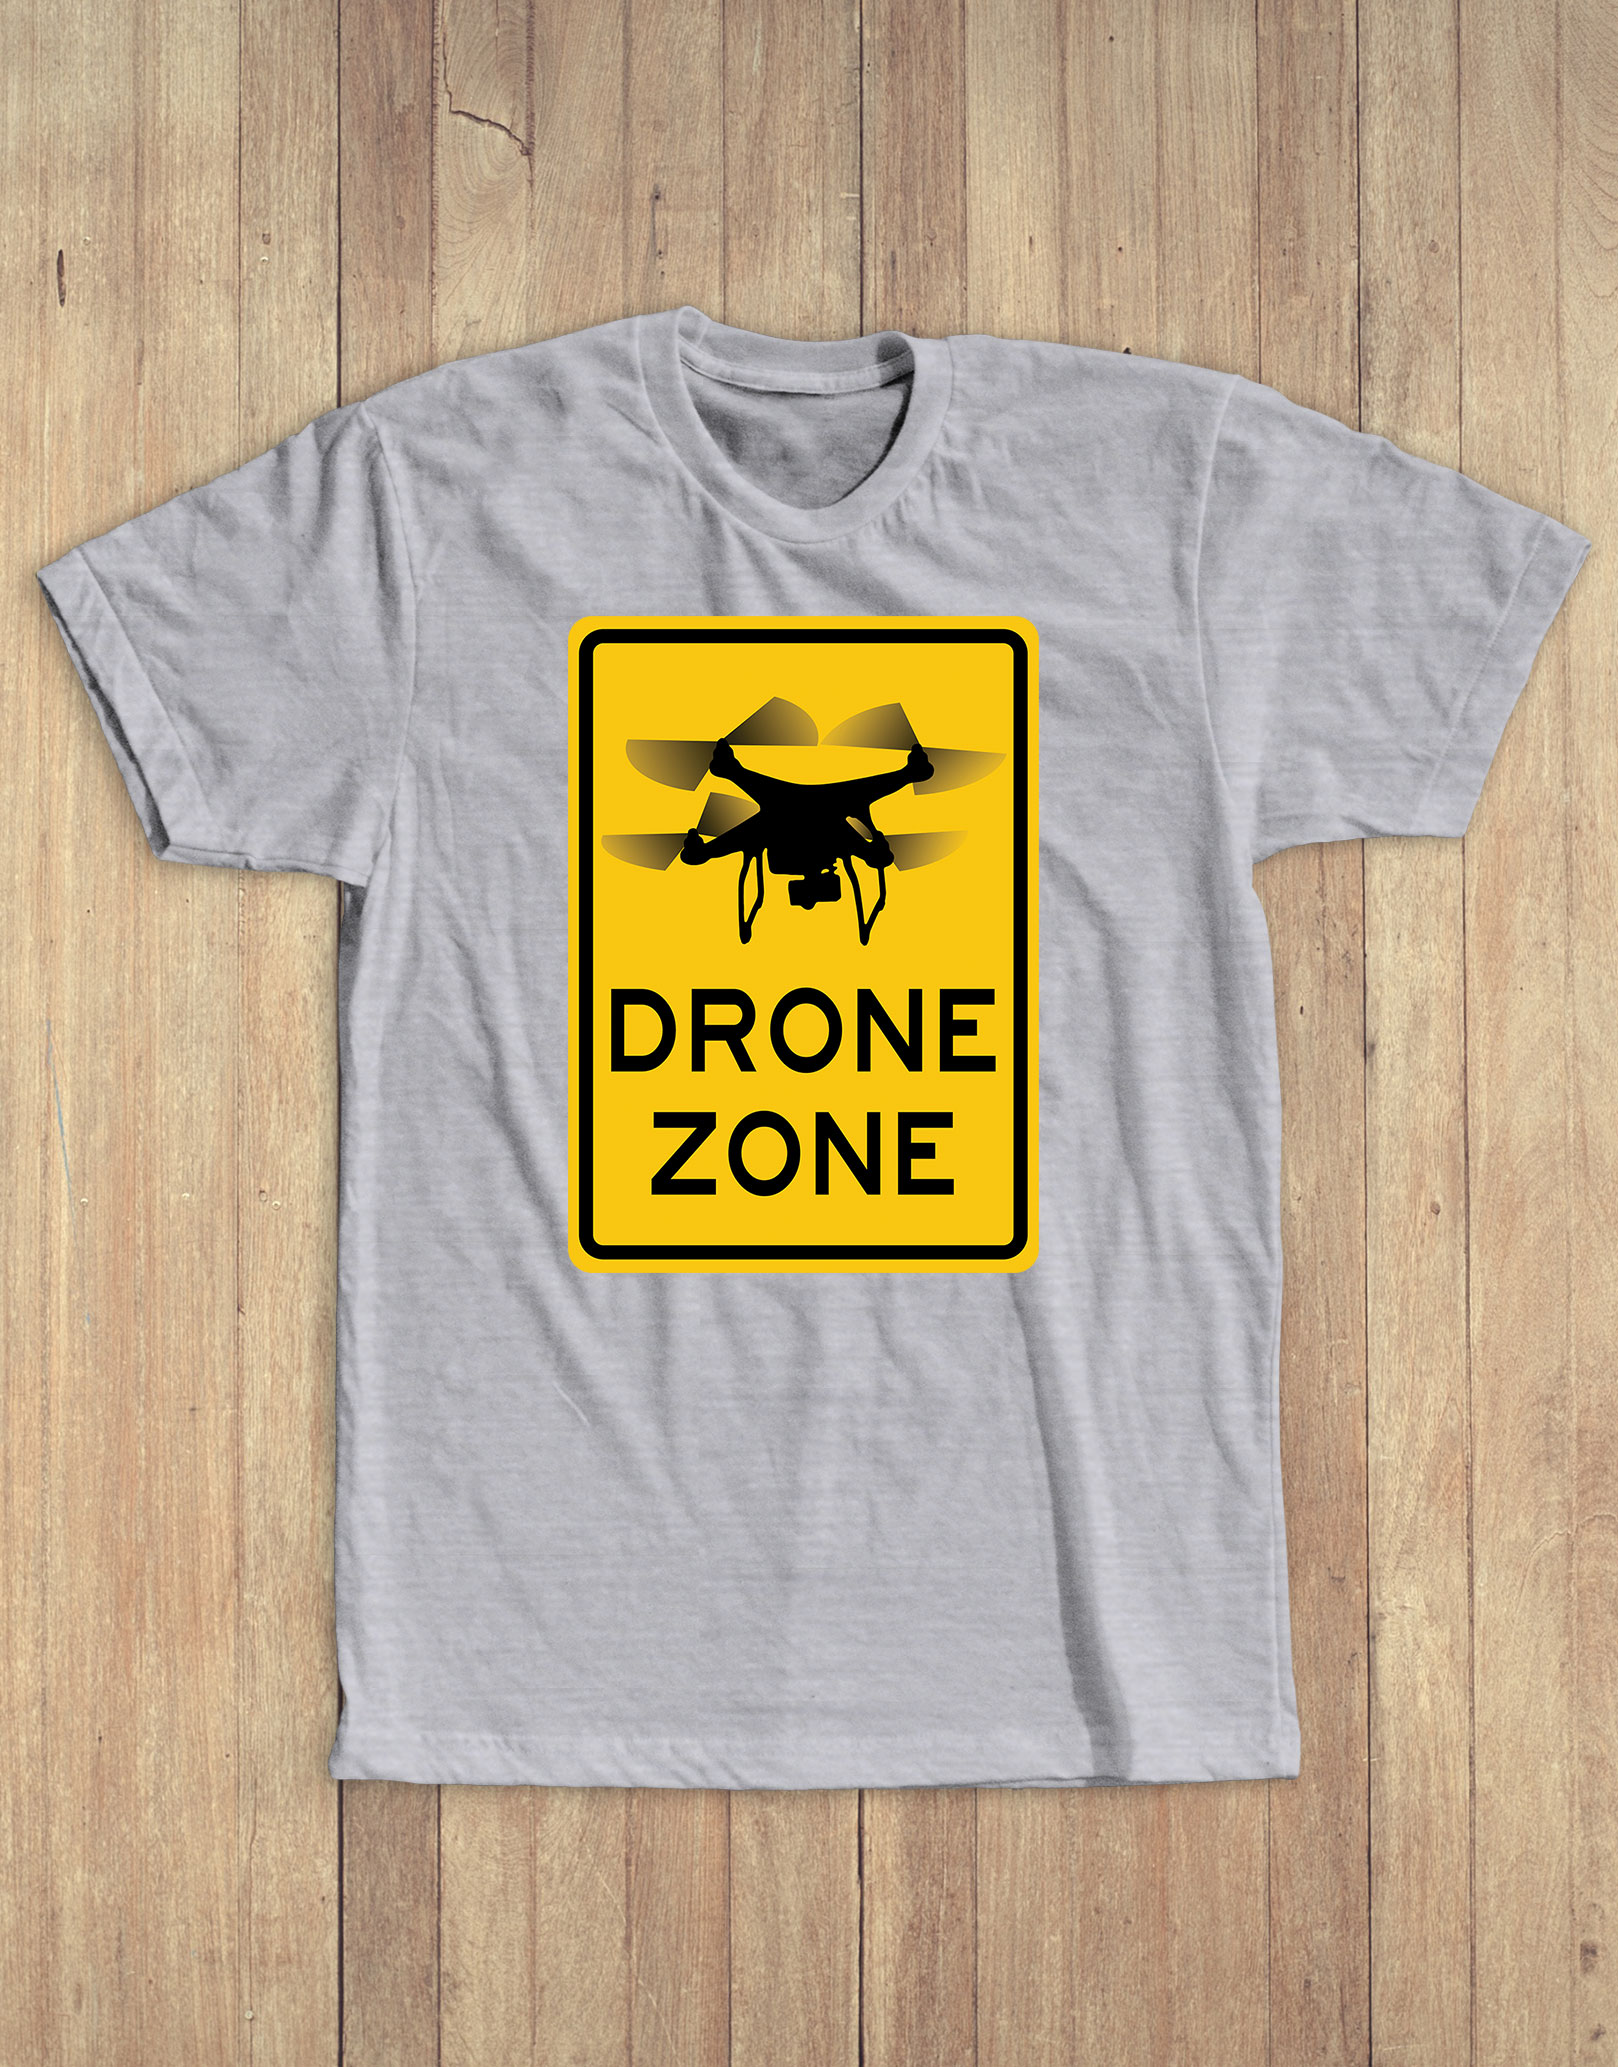 Drone zone tee grey